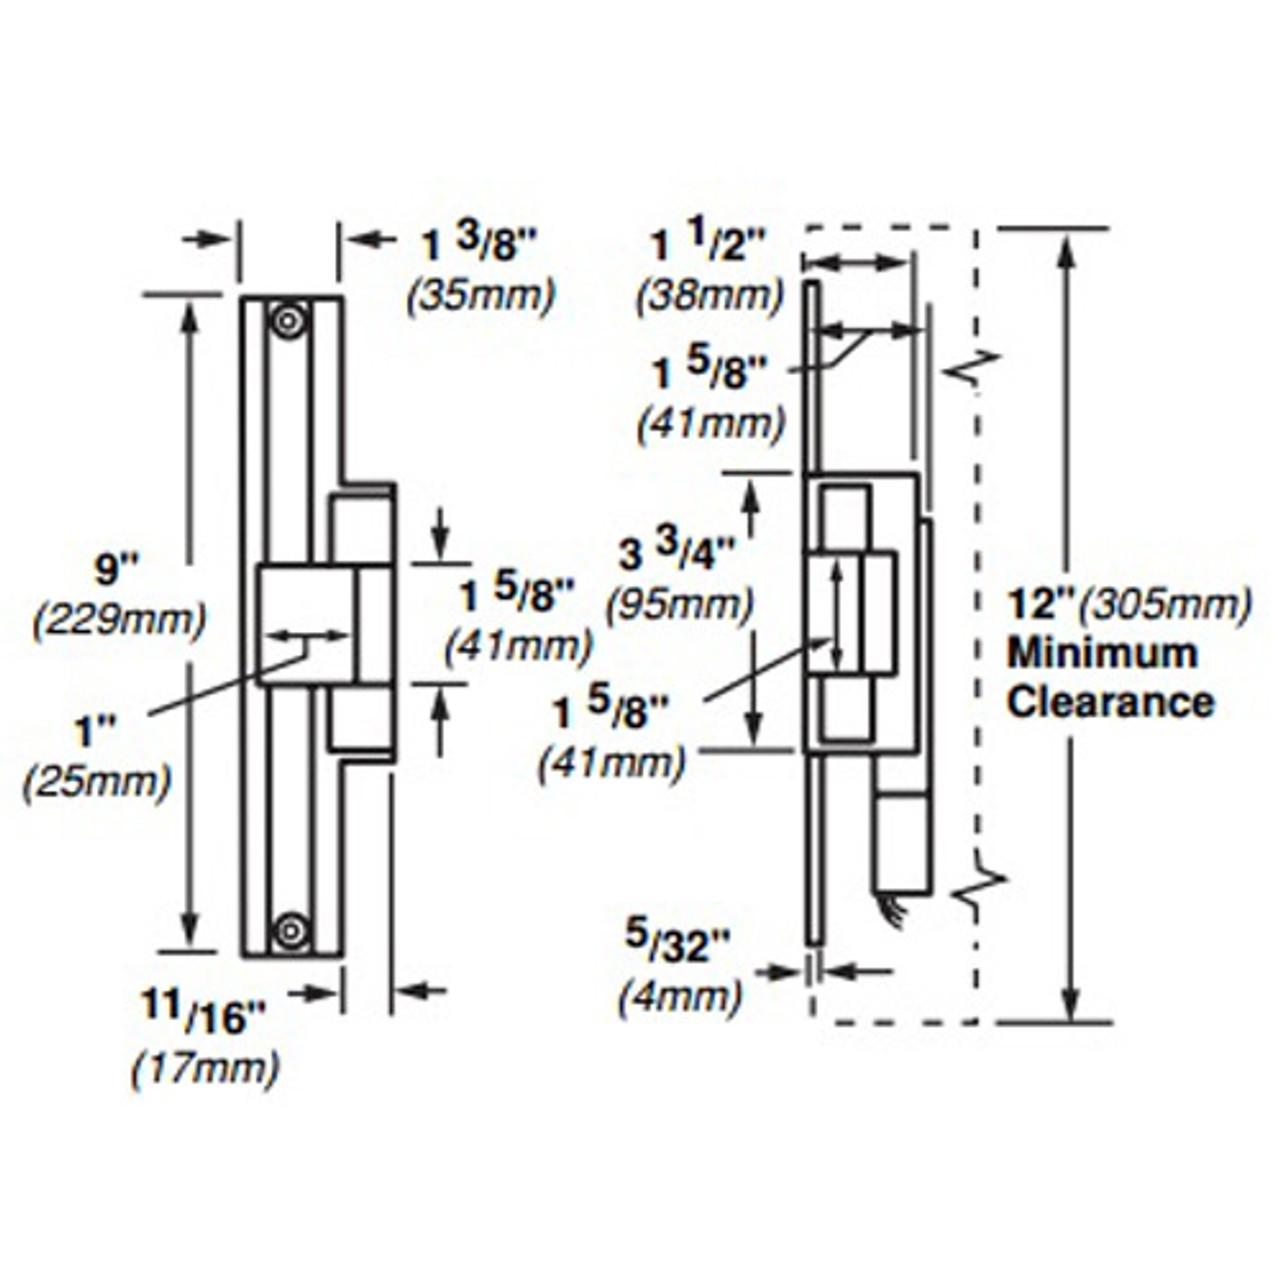 6224AL-FS-12VDC-US3 Von Duprin Electric Strike for Mortise or Cylindrical Locksets in Bright Brass Finish